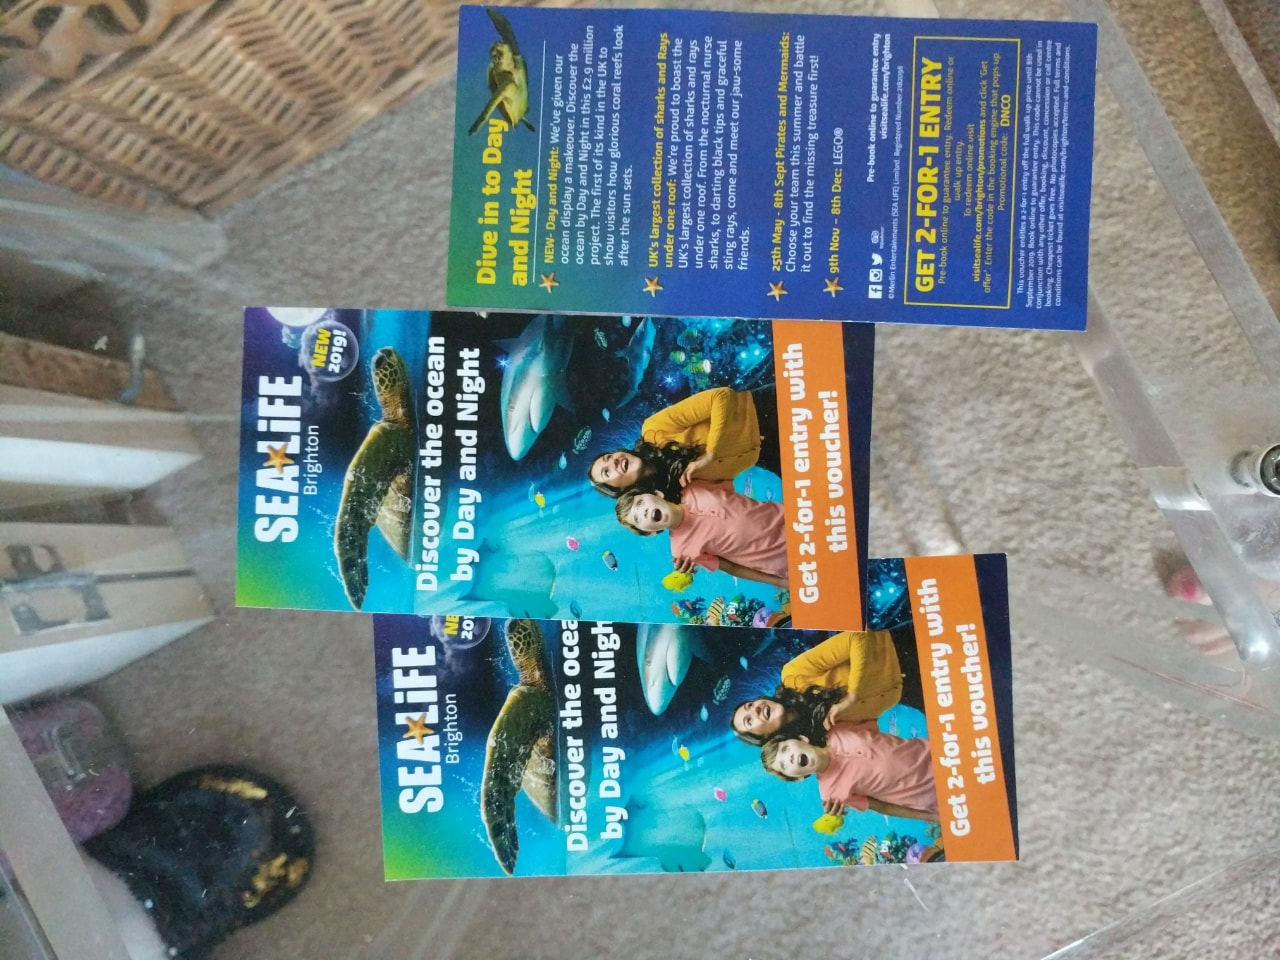 3 X 2-4-1 sealife center